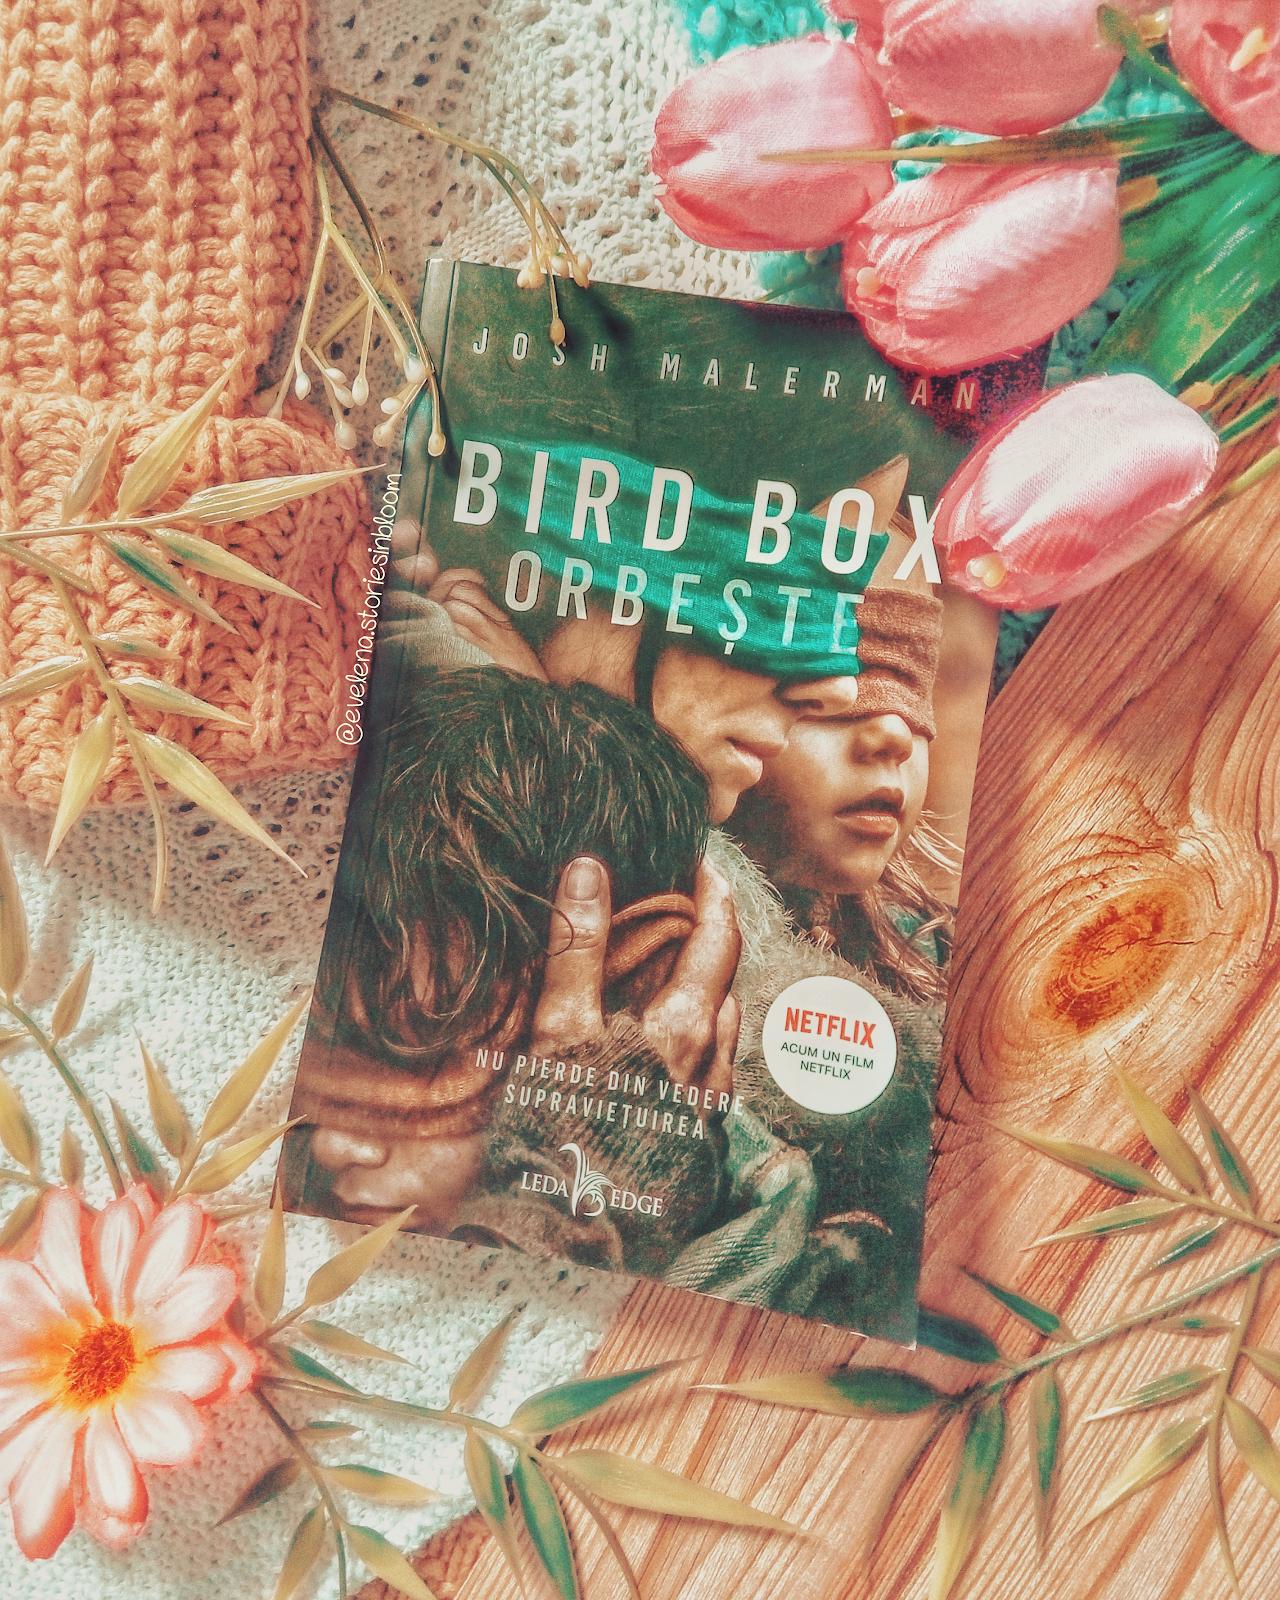 Bird Box - Josh Malerman - Disparitia lui Daniel Tate - Cristin Terrill - pareri review recenzie